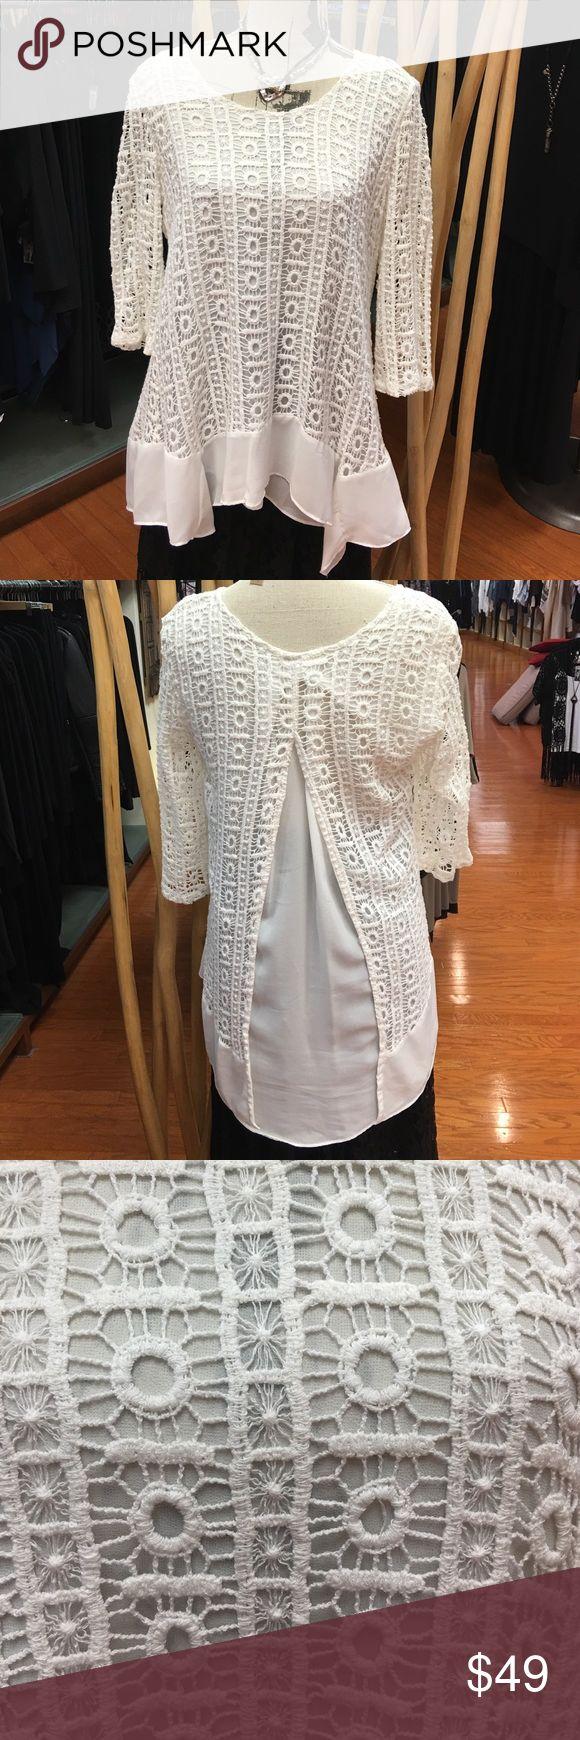 Off white crocheted top. Off white crocheted top. Three quarter sleeve. Lined. Split back detail. Handkerchief Style border. Monoreno Tops Blouses